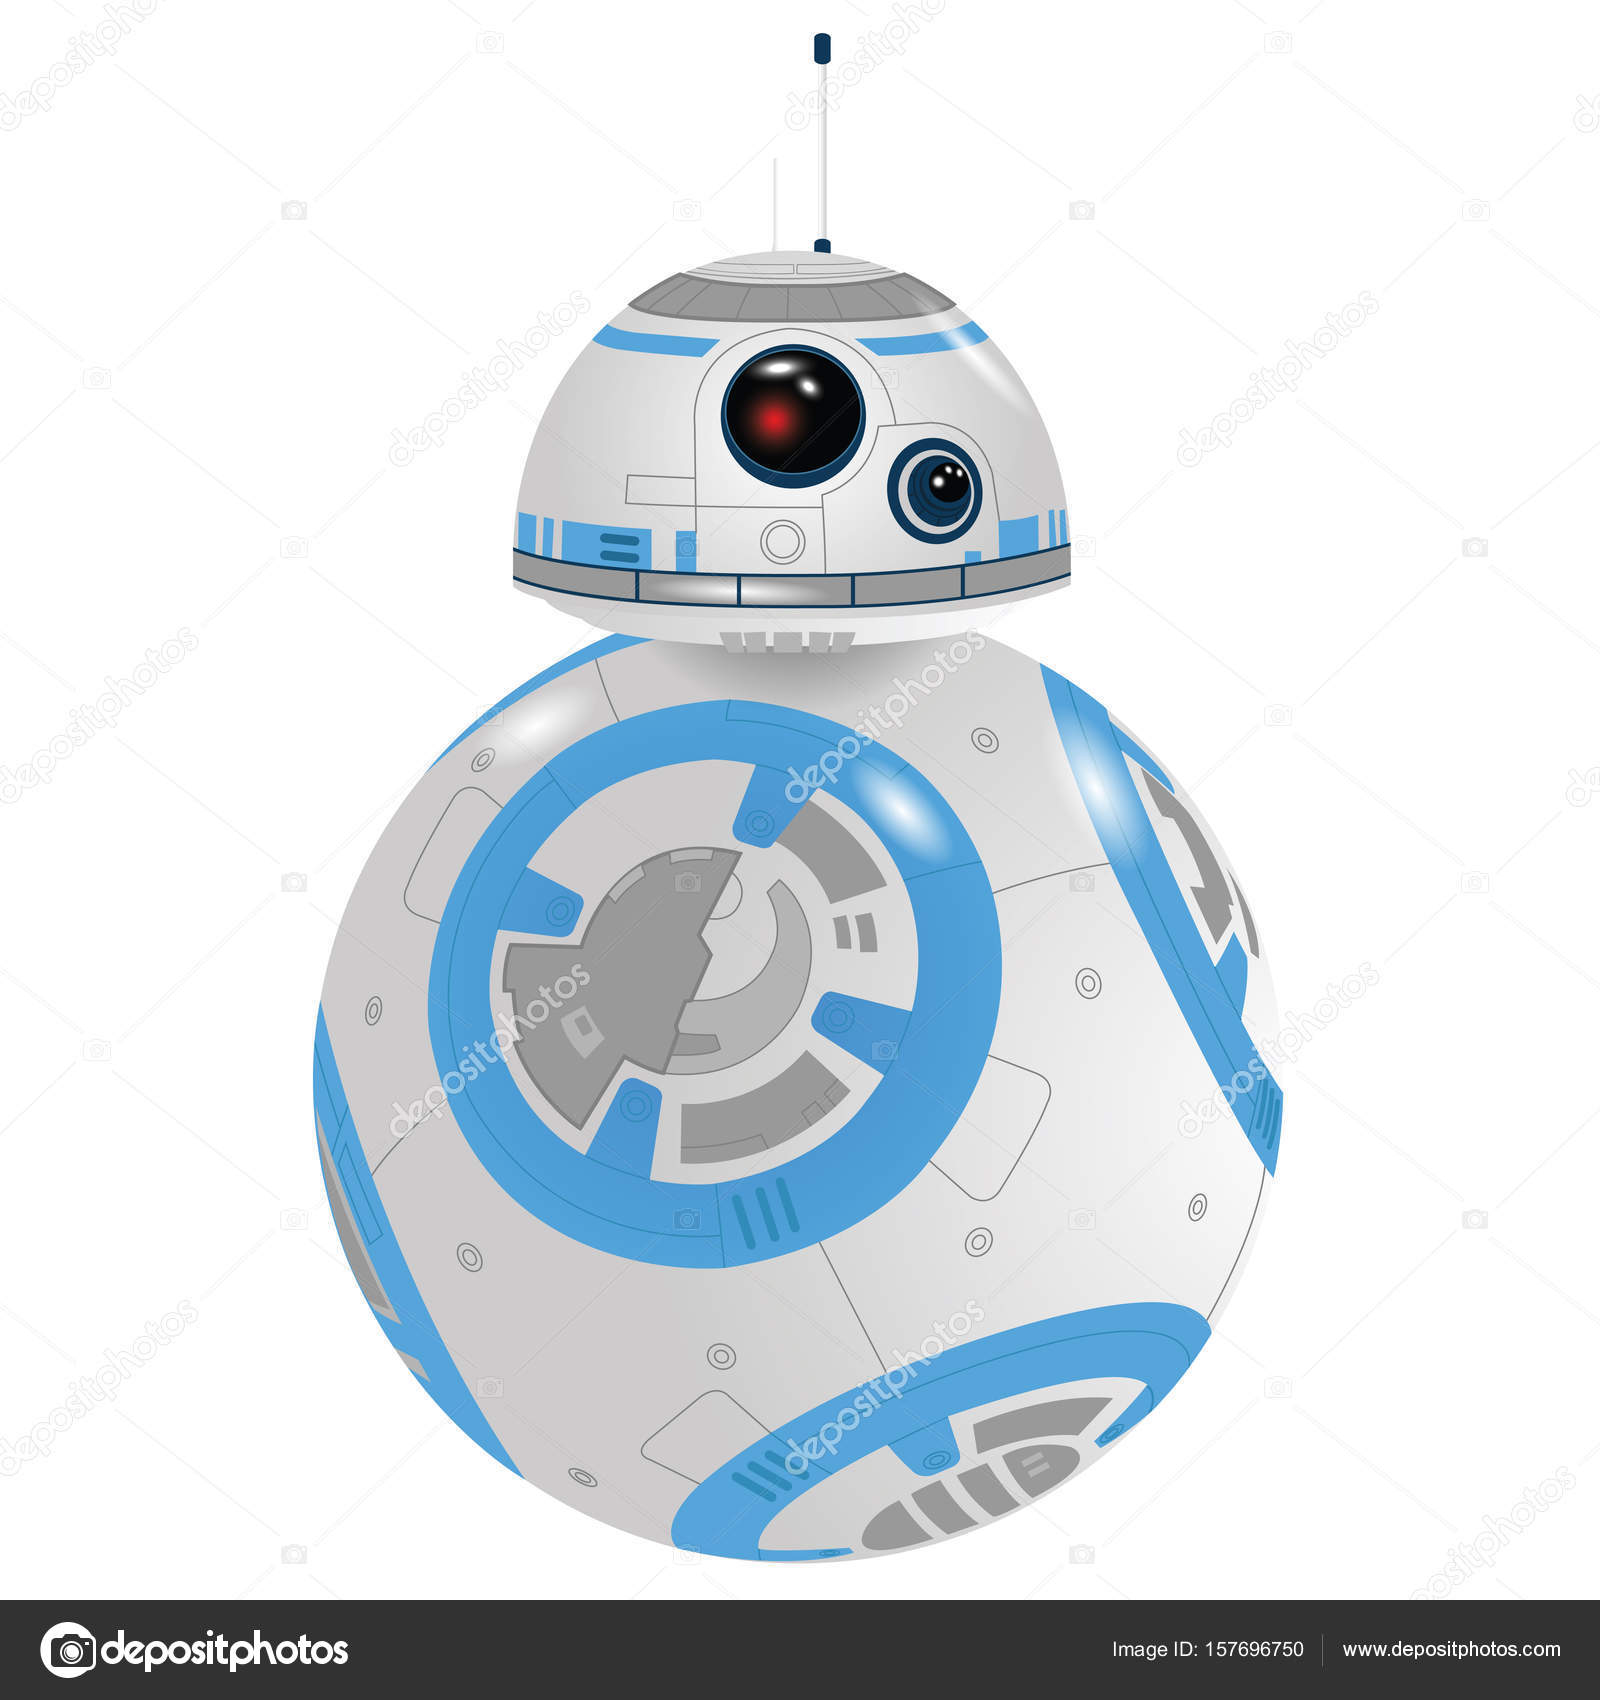 desenho vetorial bb8 droid vetores de stock vectoruss 157696750